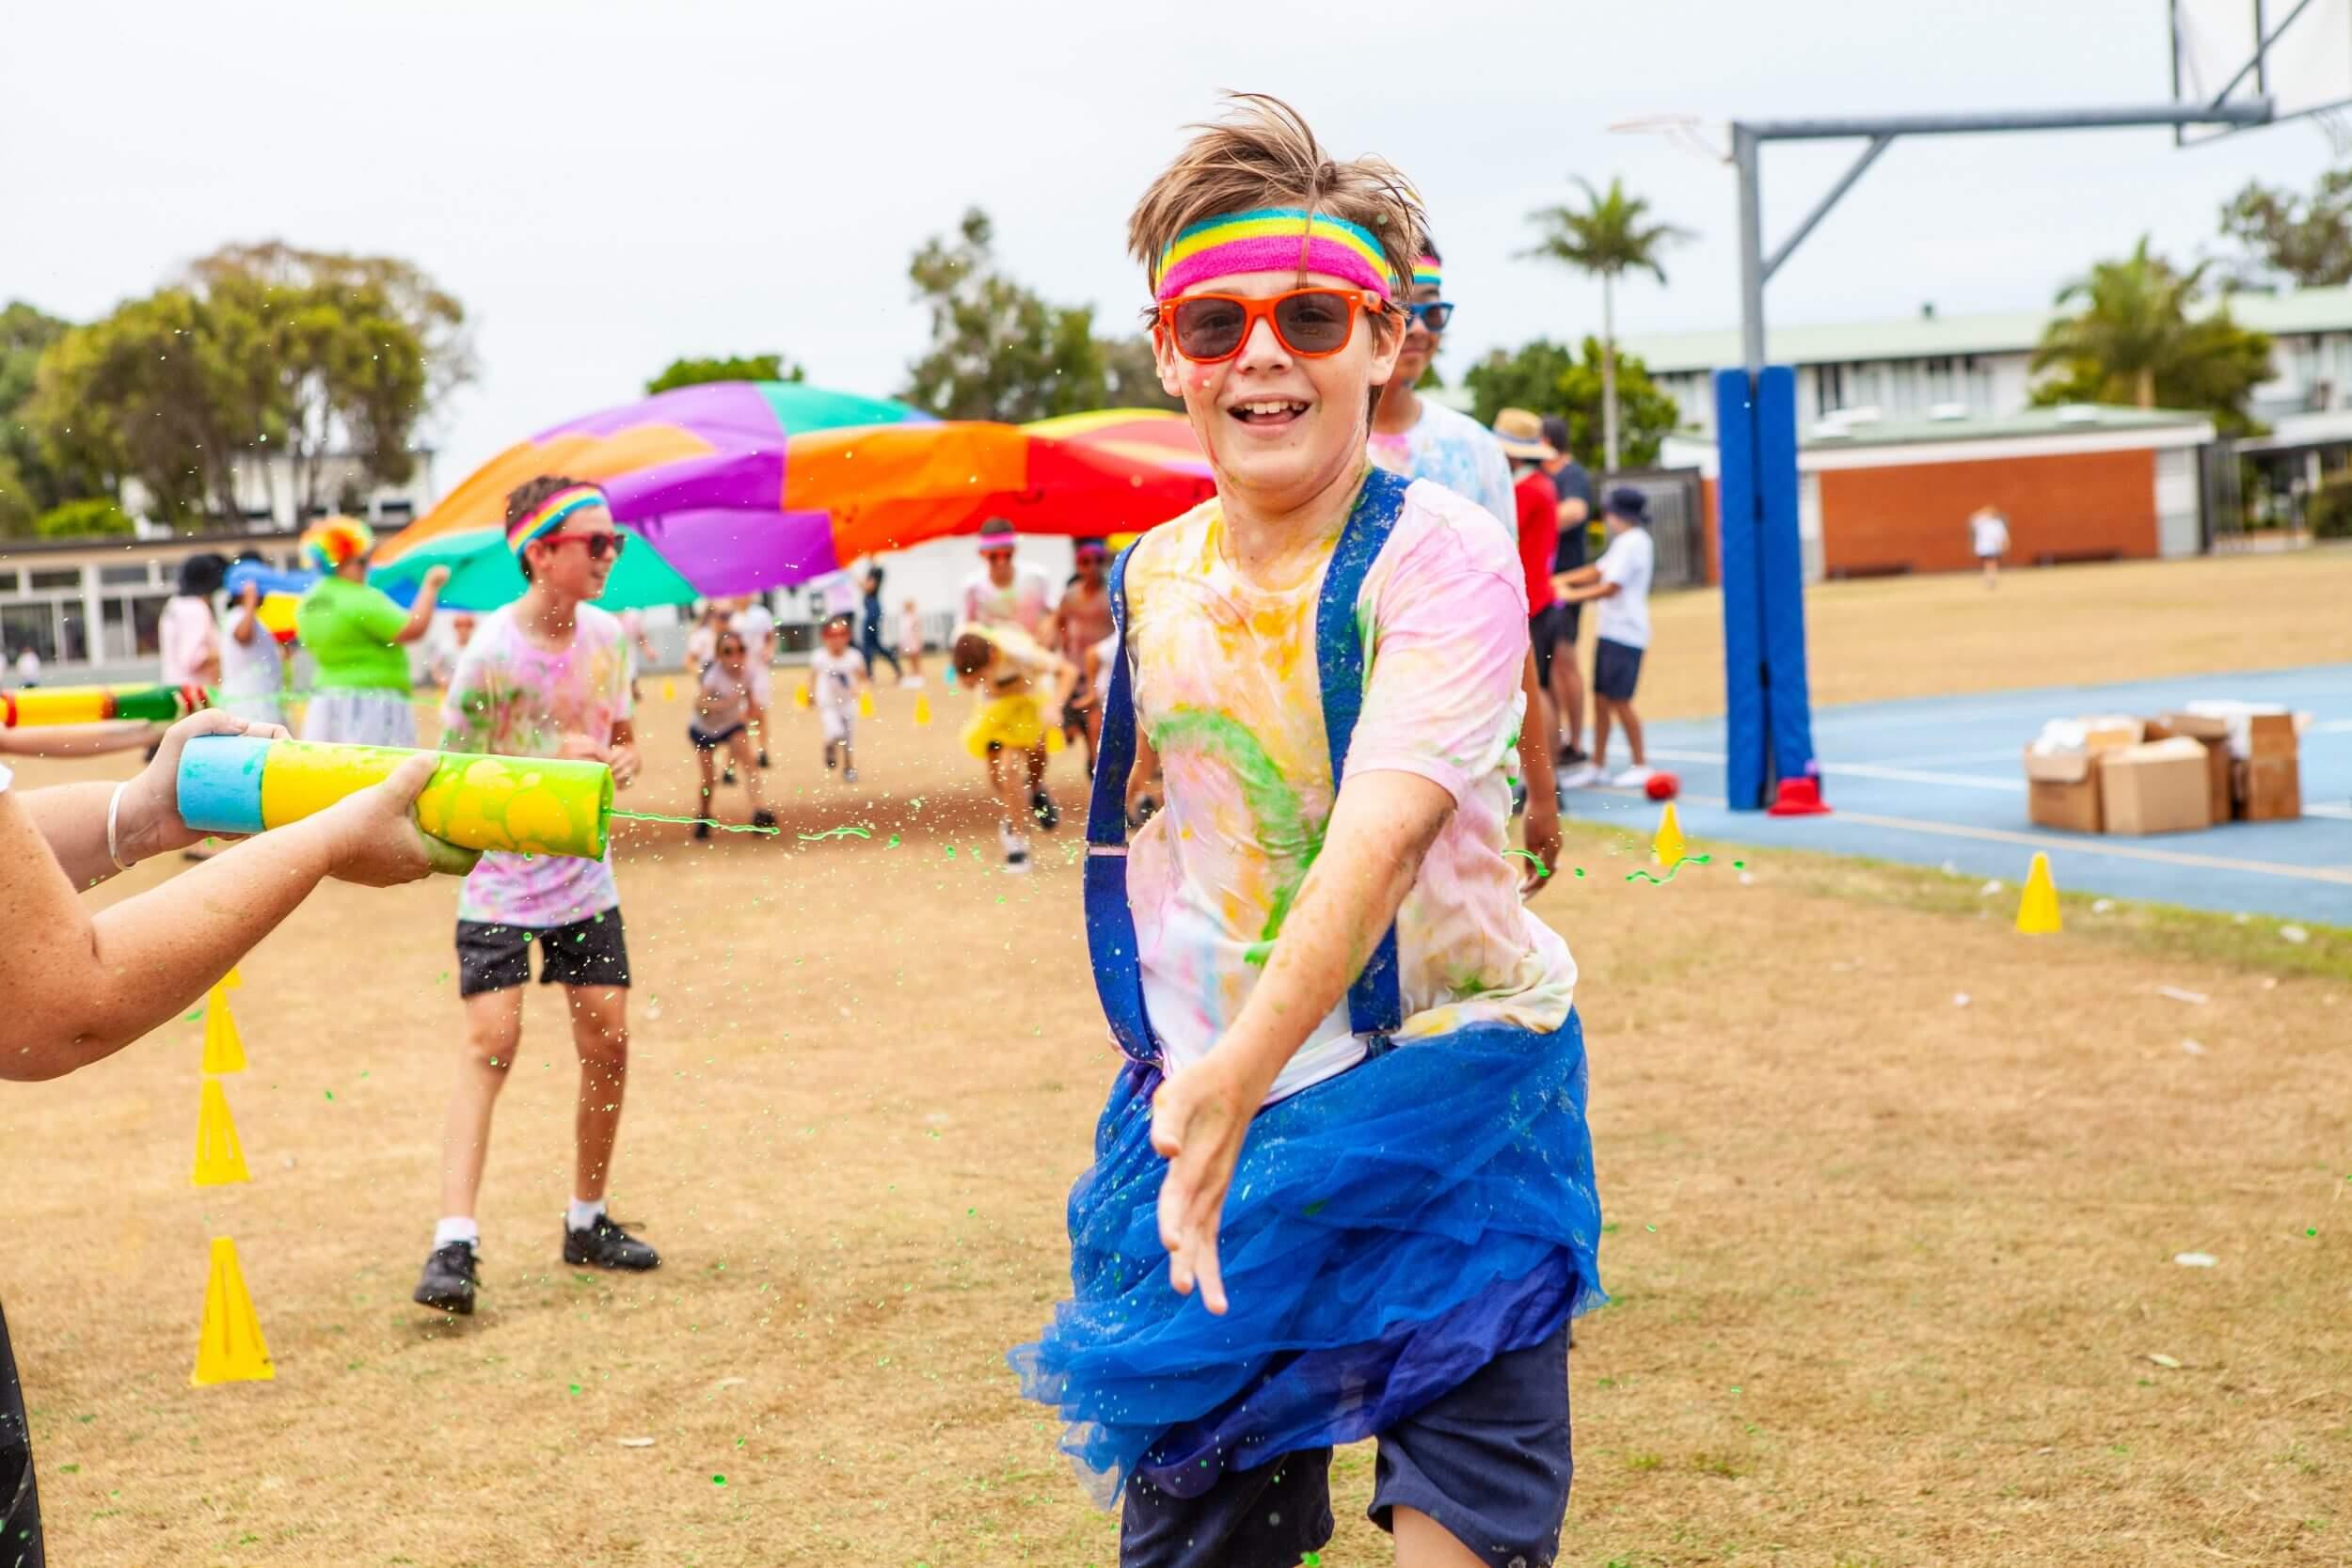 Slime Spectacular School Fun Run is the silliest fundraiser yet!